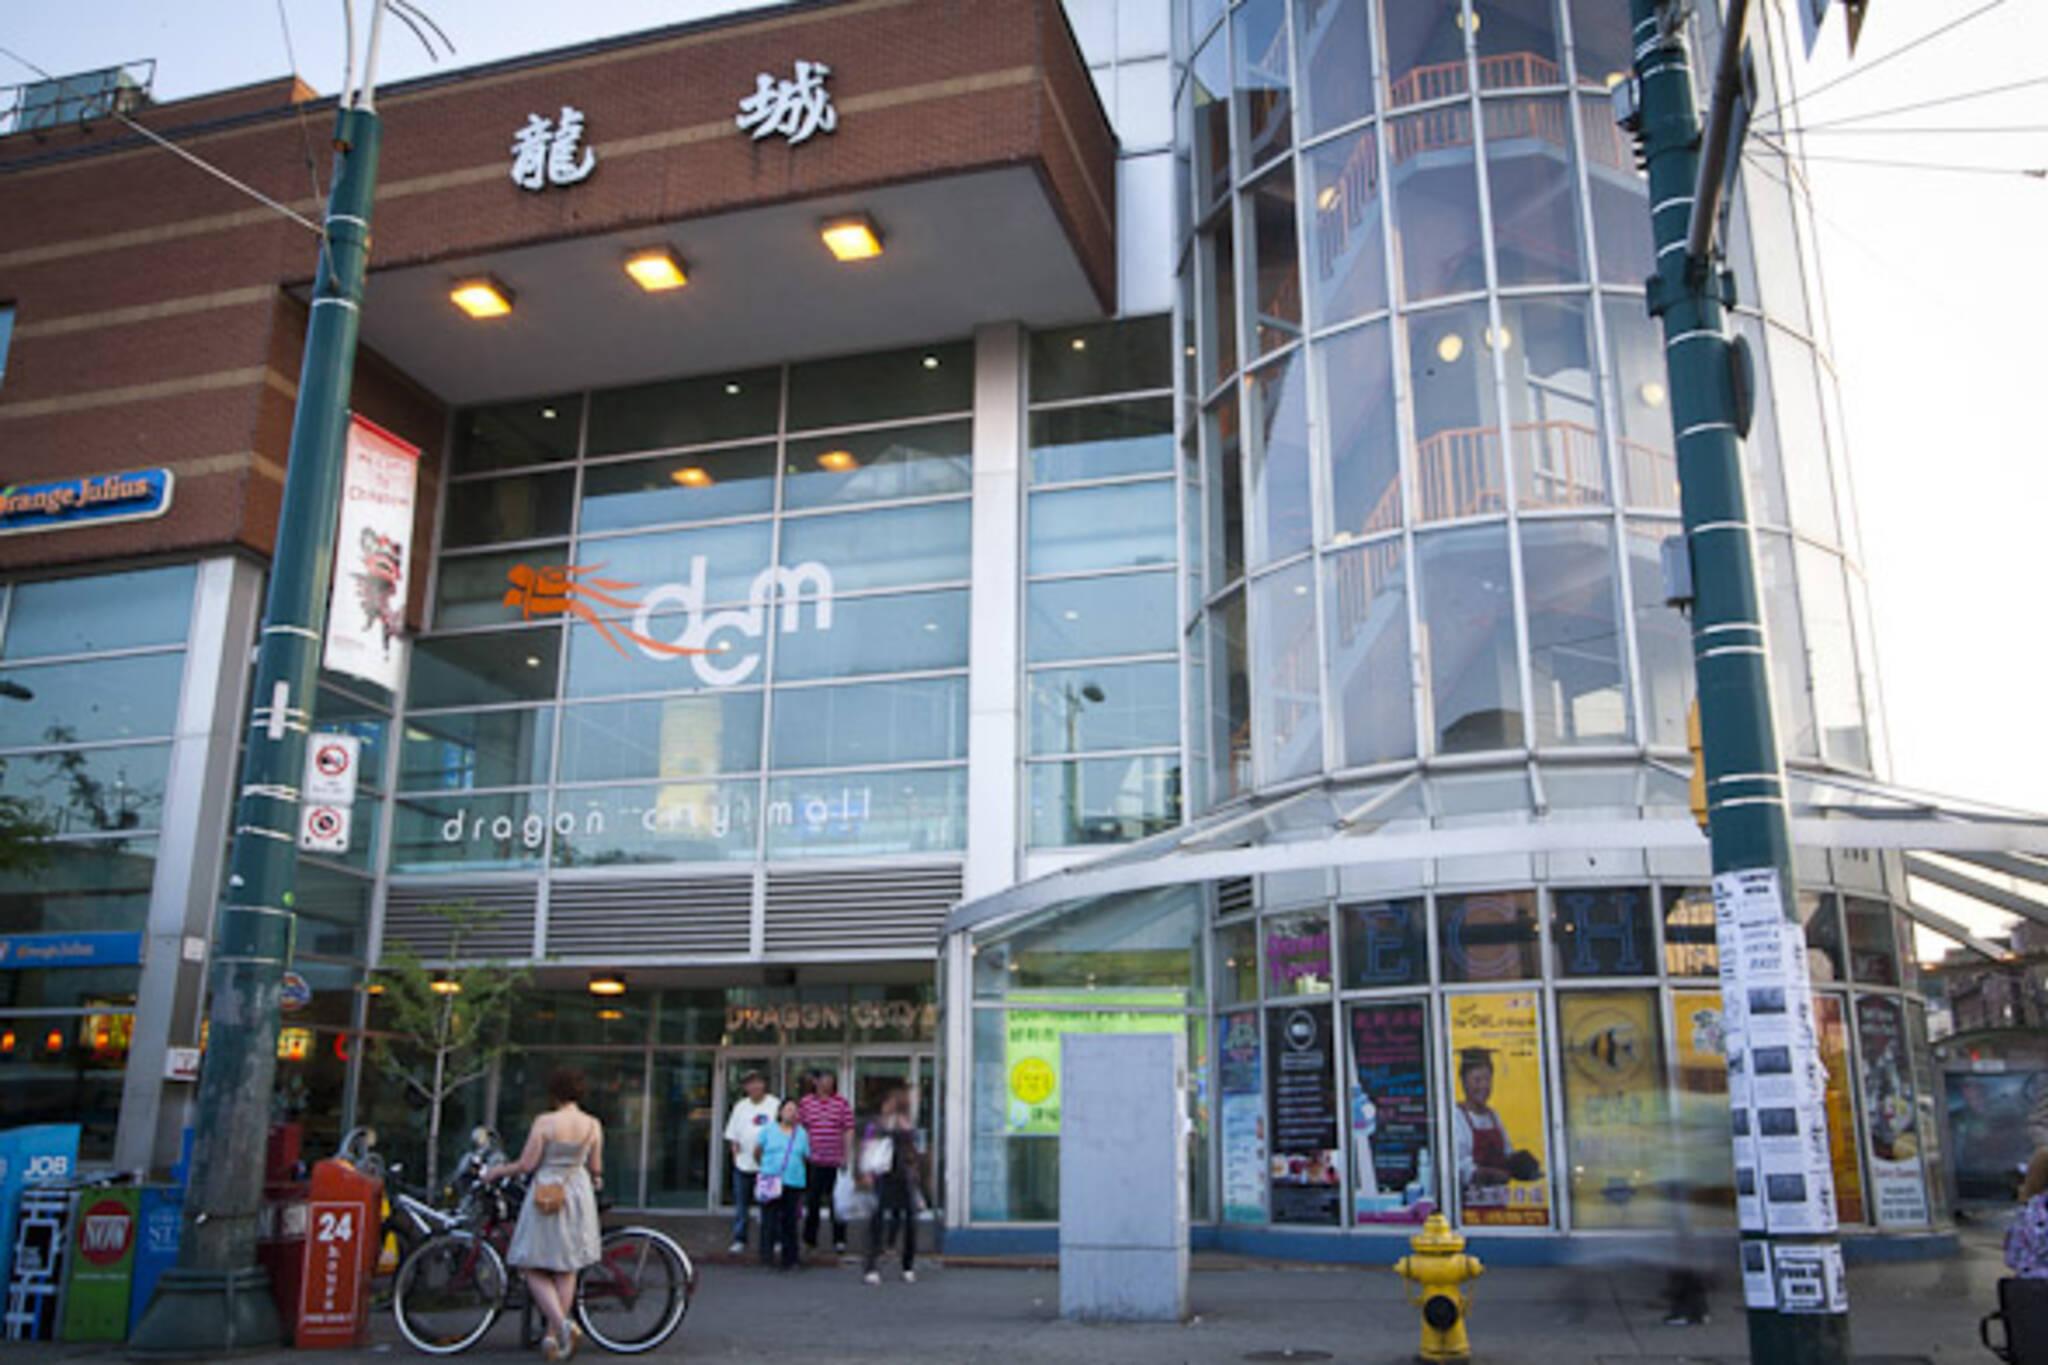 Dragon City Mall